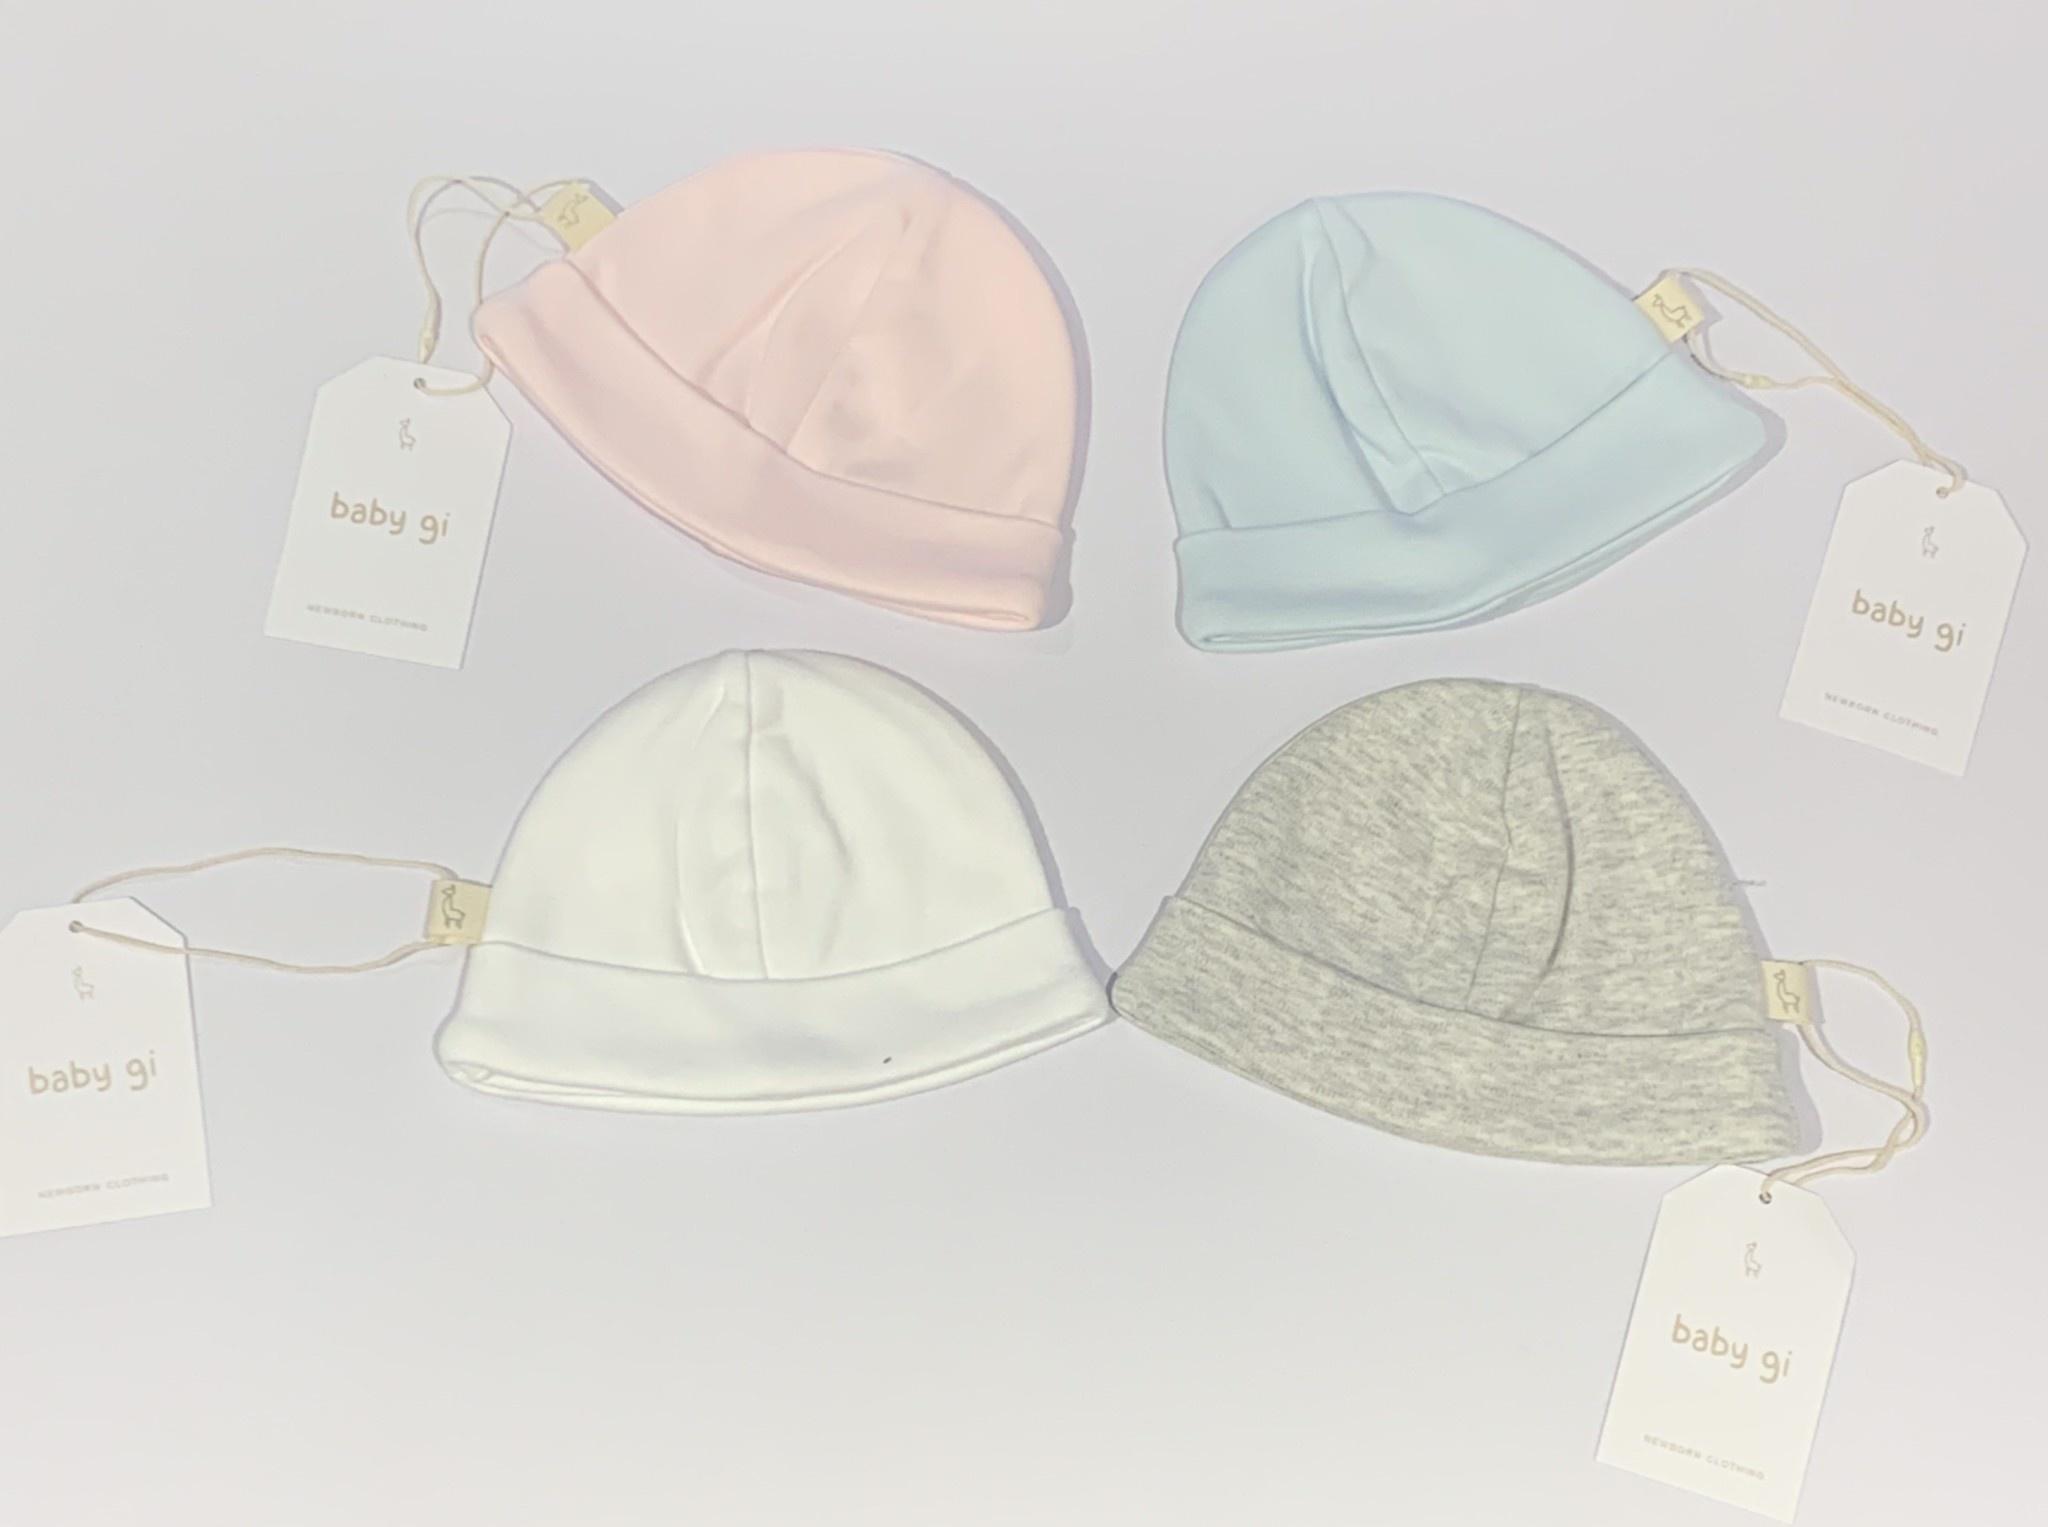 Baby Gi Baby gi cotton hat 0-1 month